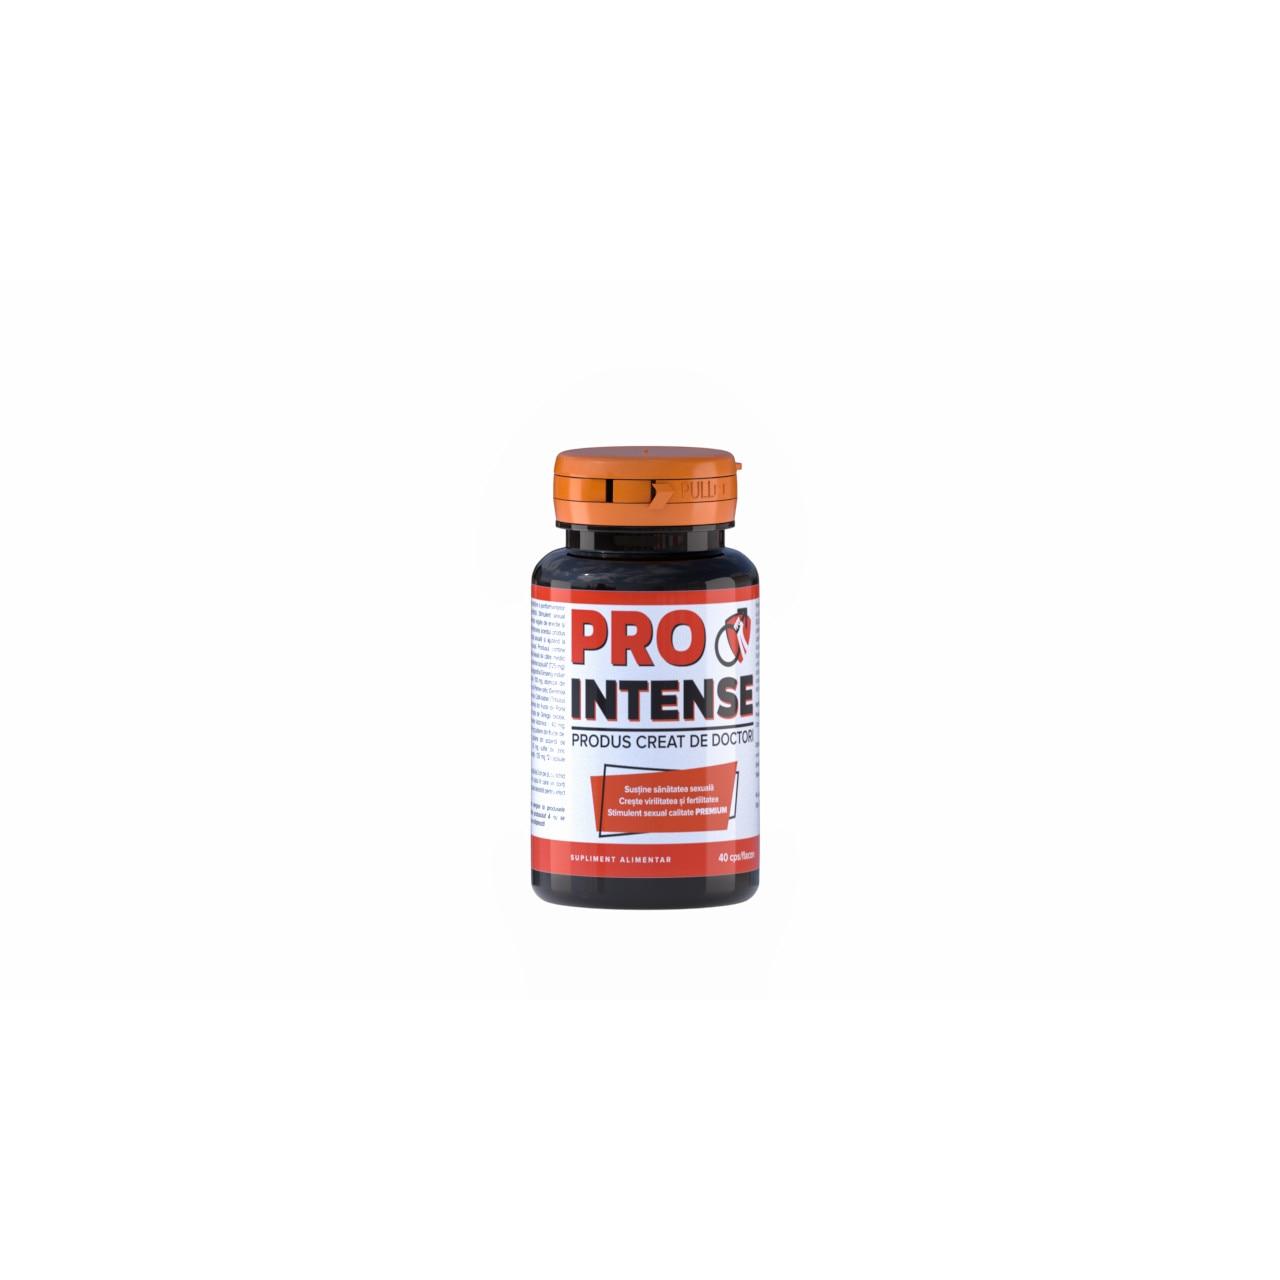 Suplimente alimentare, pastile de slabit si proteine de vanzare. Anunturi - erectie